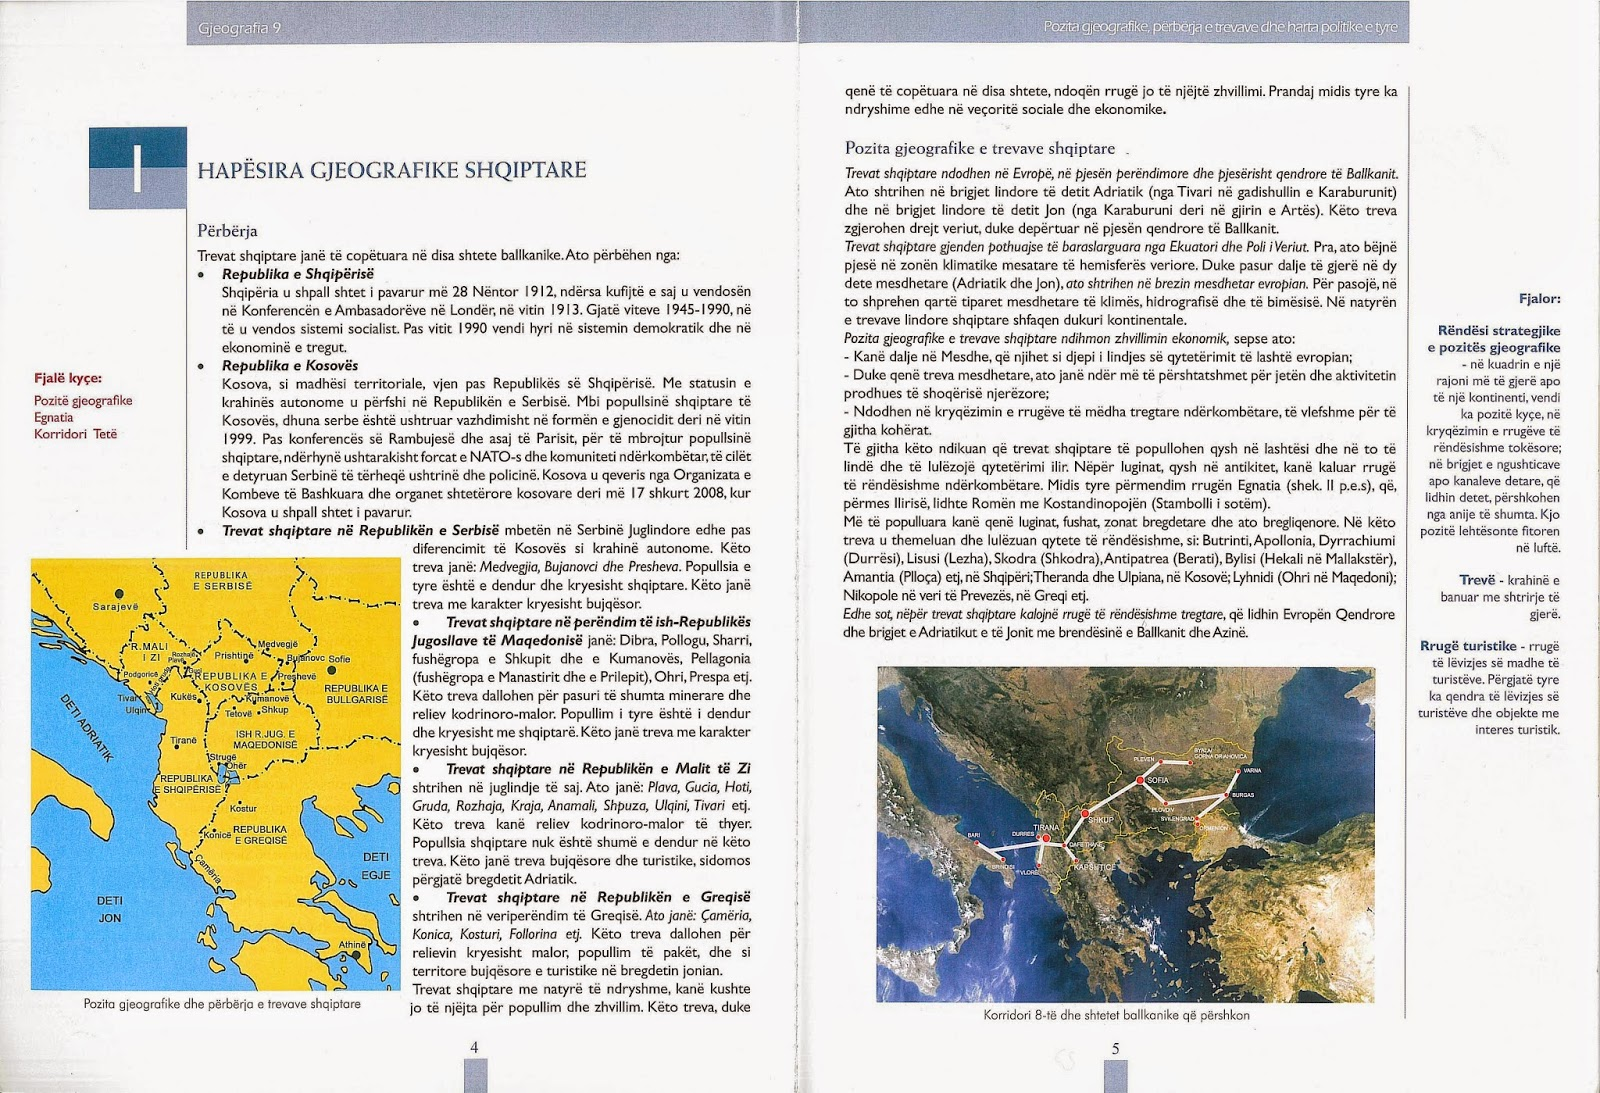 GJEOGRAFIA 9 σελ 4-5